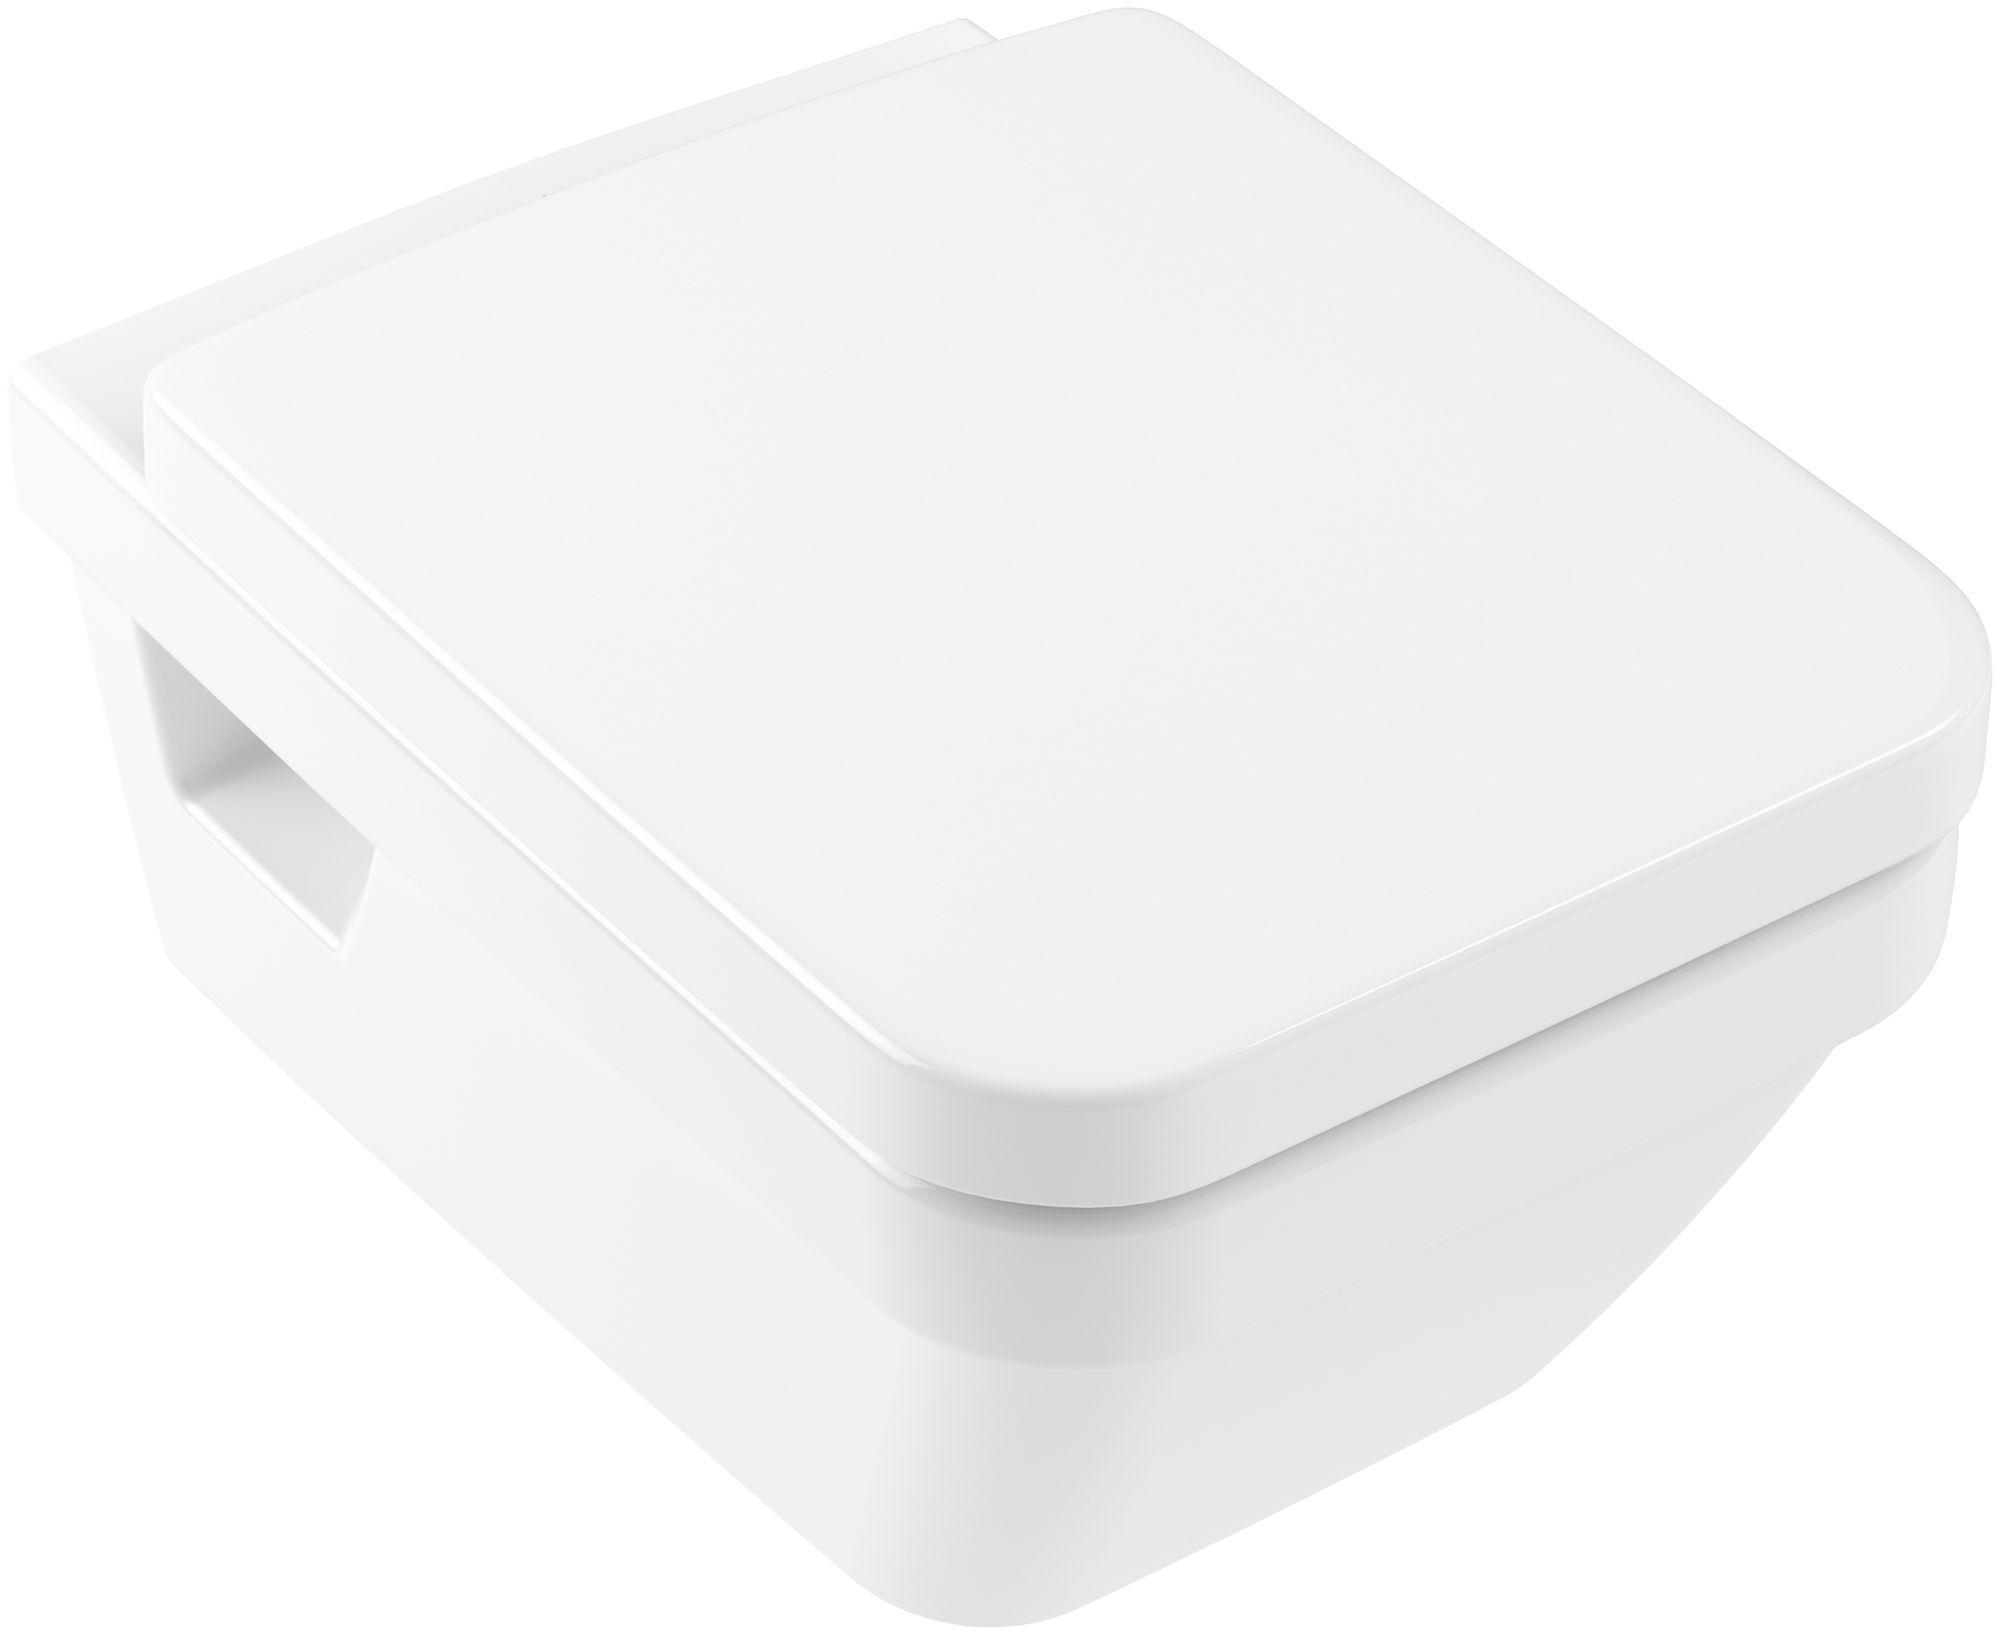 Villeroy & Boch Architectura Tiefspül-Wand-WC spülrandlos DirectFlush B:37xL:53cm Weiß AntiBac CeramicPlus 5685R0T2